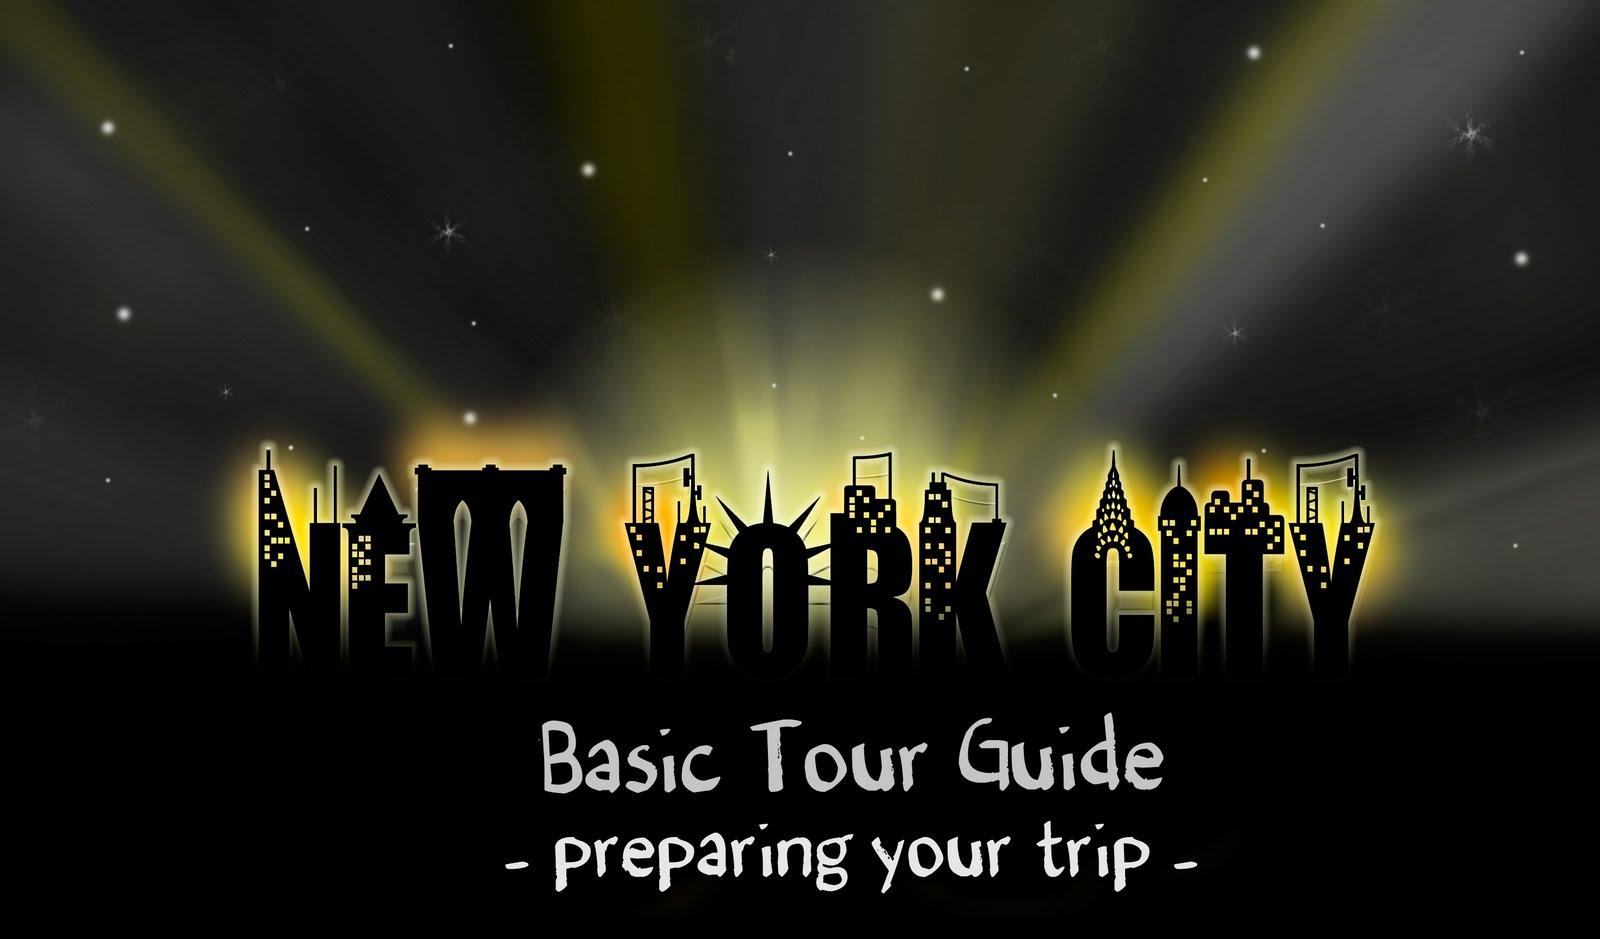 New York City Tour Guide Course